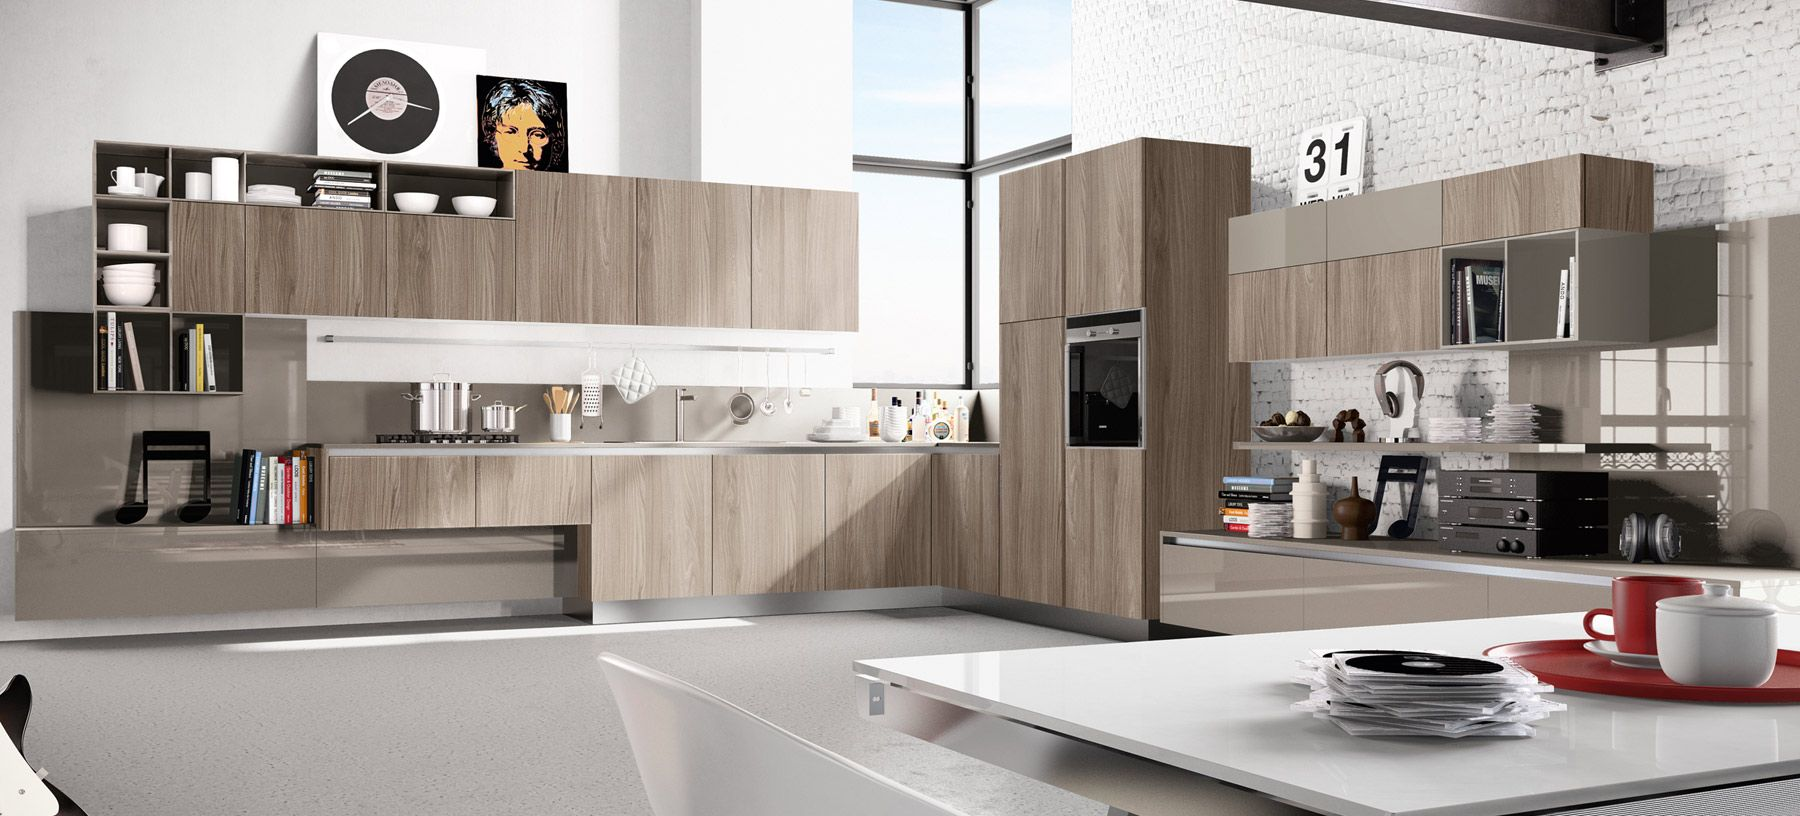 diseo de cocinas modernas al estilo arte pop large kitchen designl - Kitchen Wall Units Designs